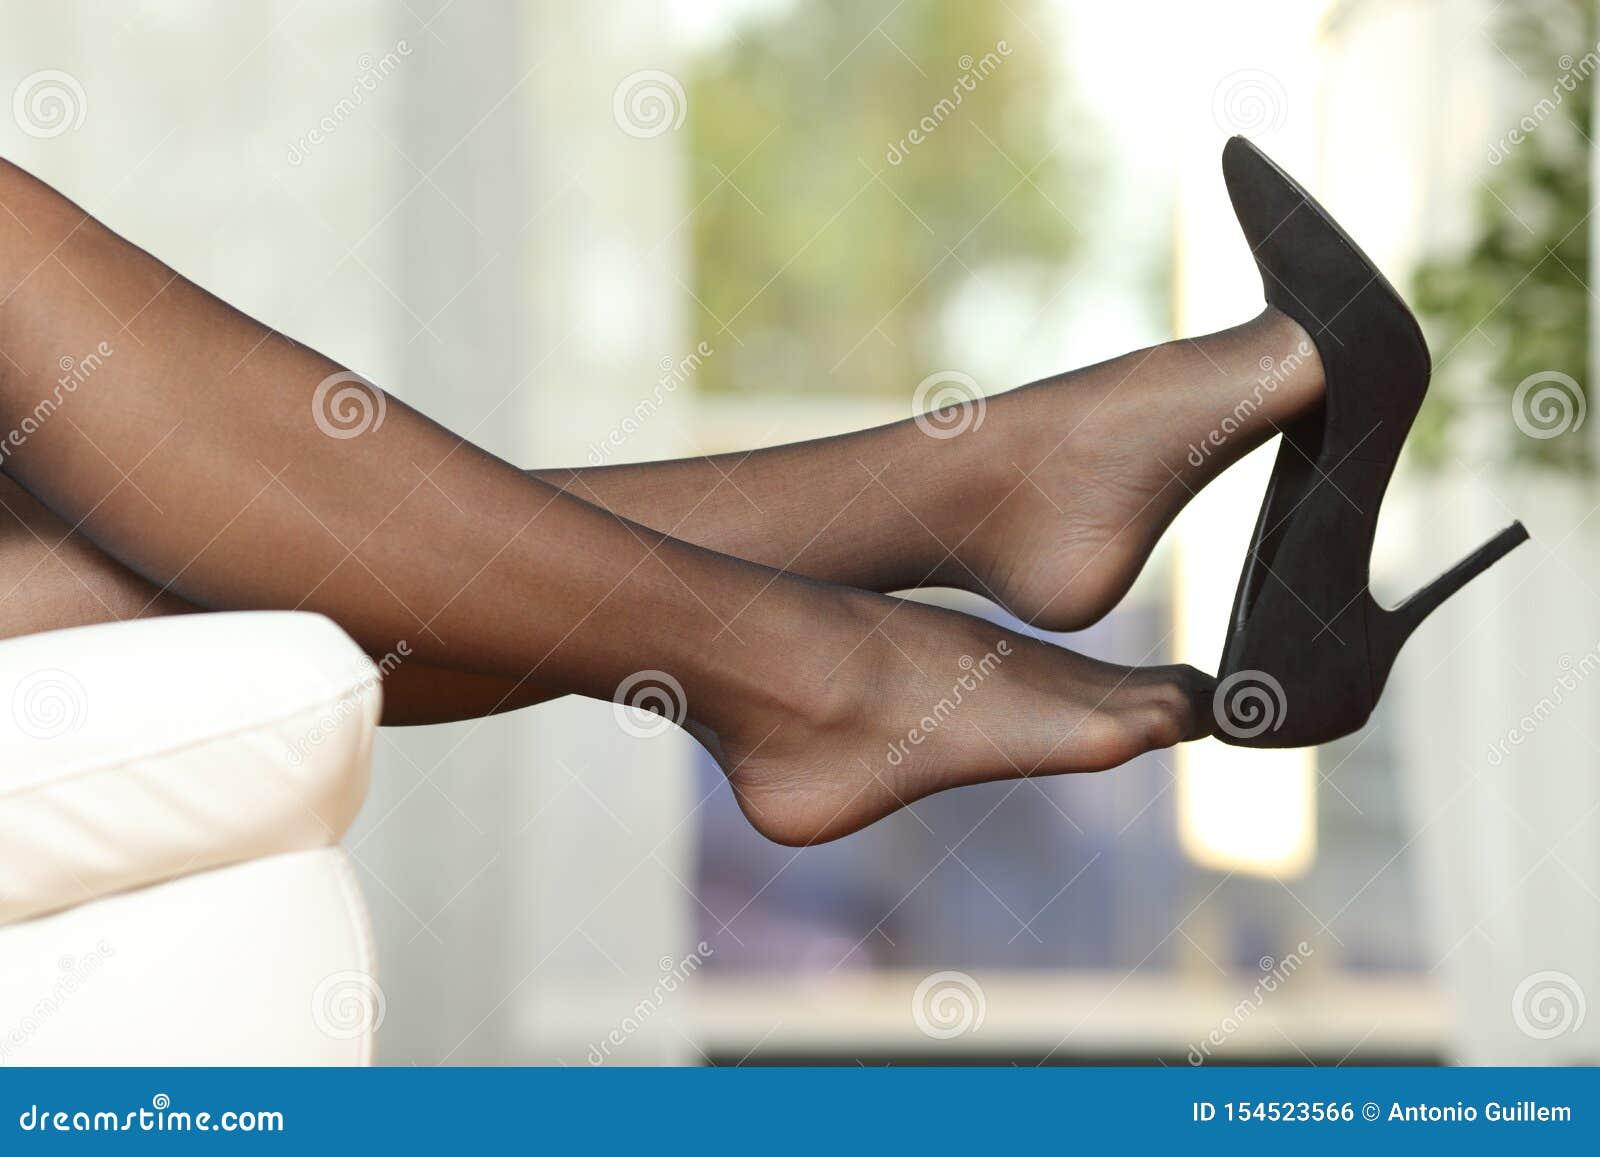 Taking Off Stockings Feet